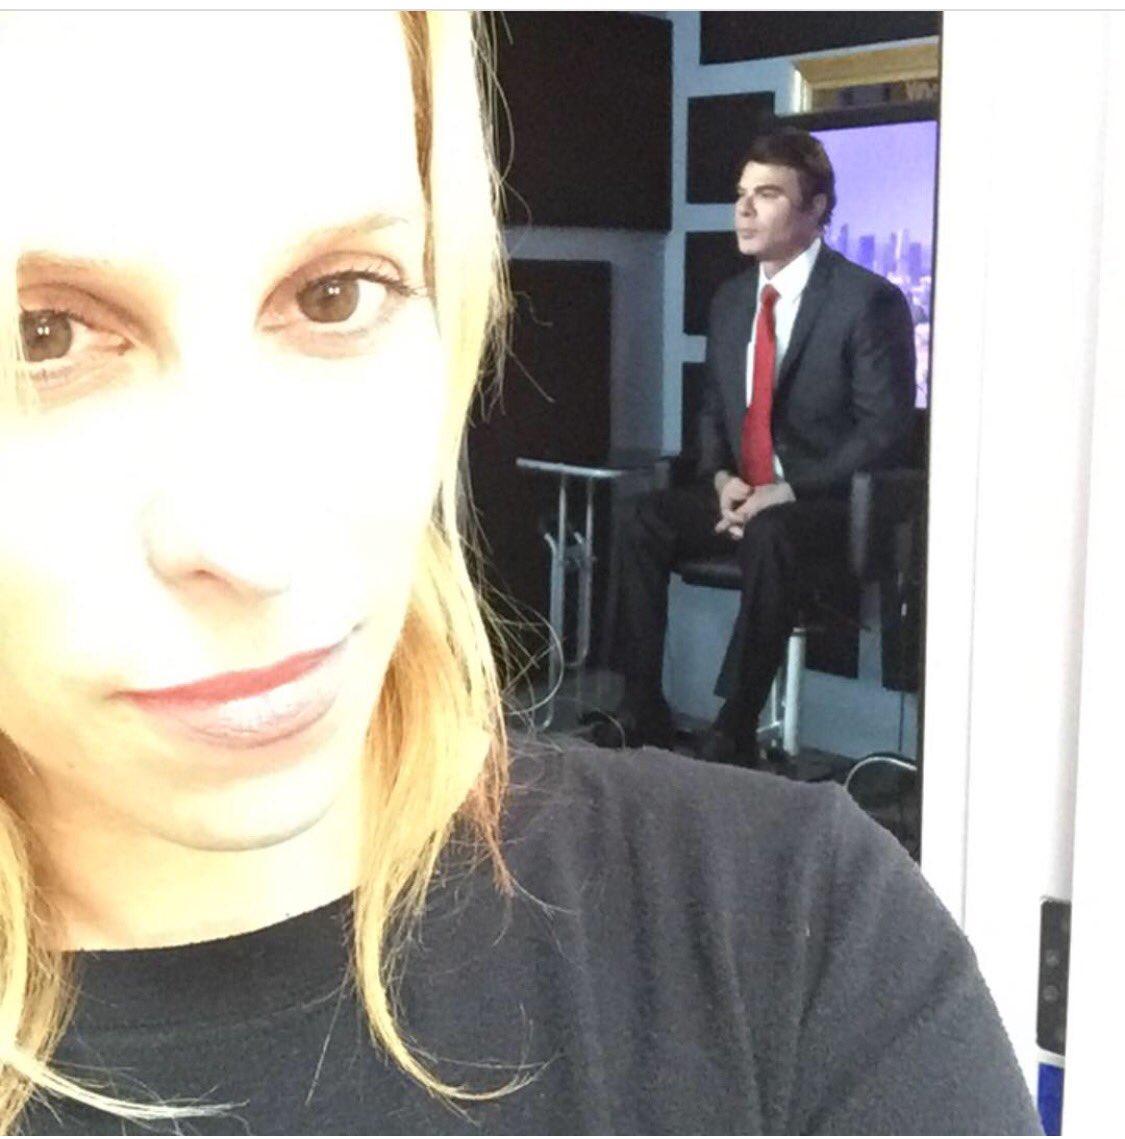 Supporting my man @ericschiffer on @foxnews. https://t.co/327J3pvmJ3